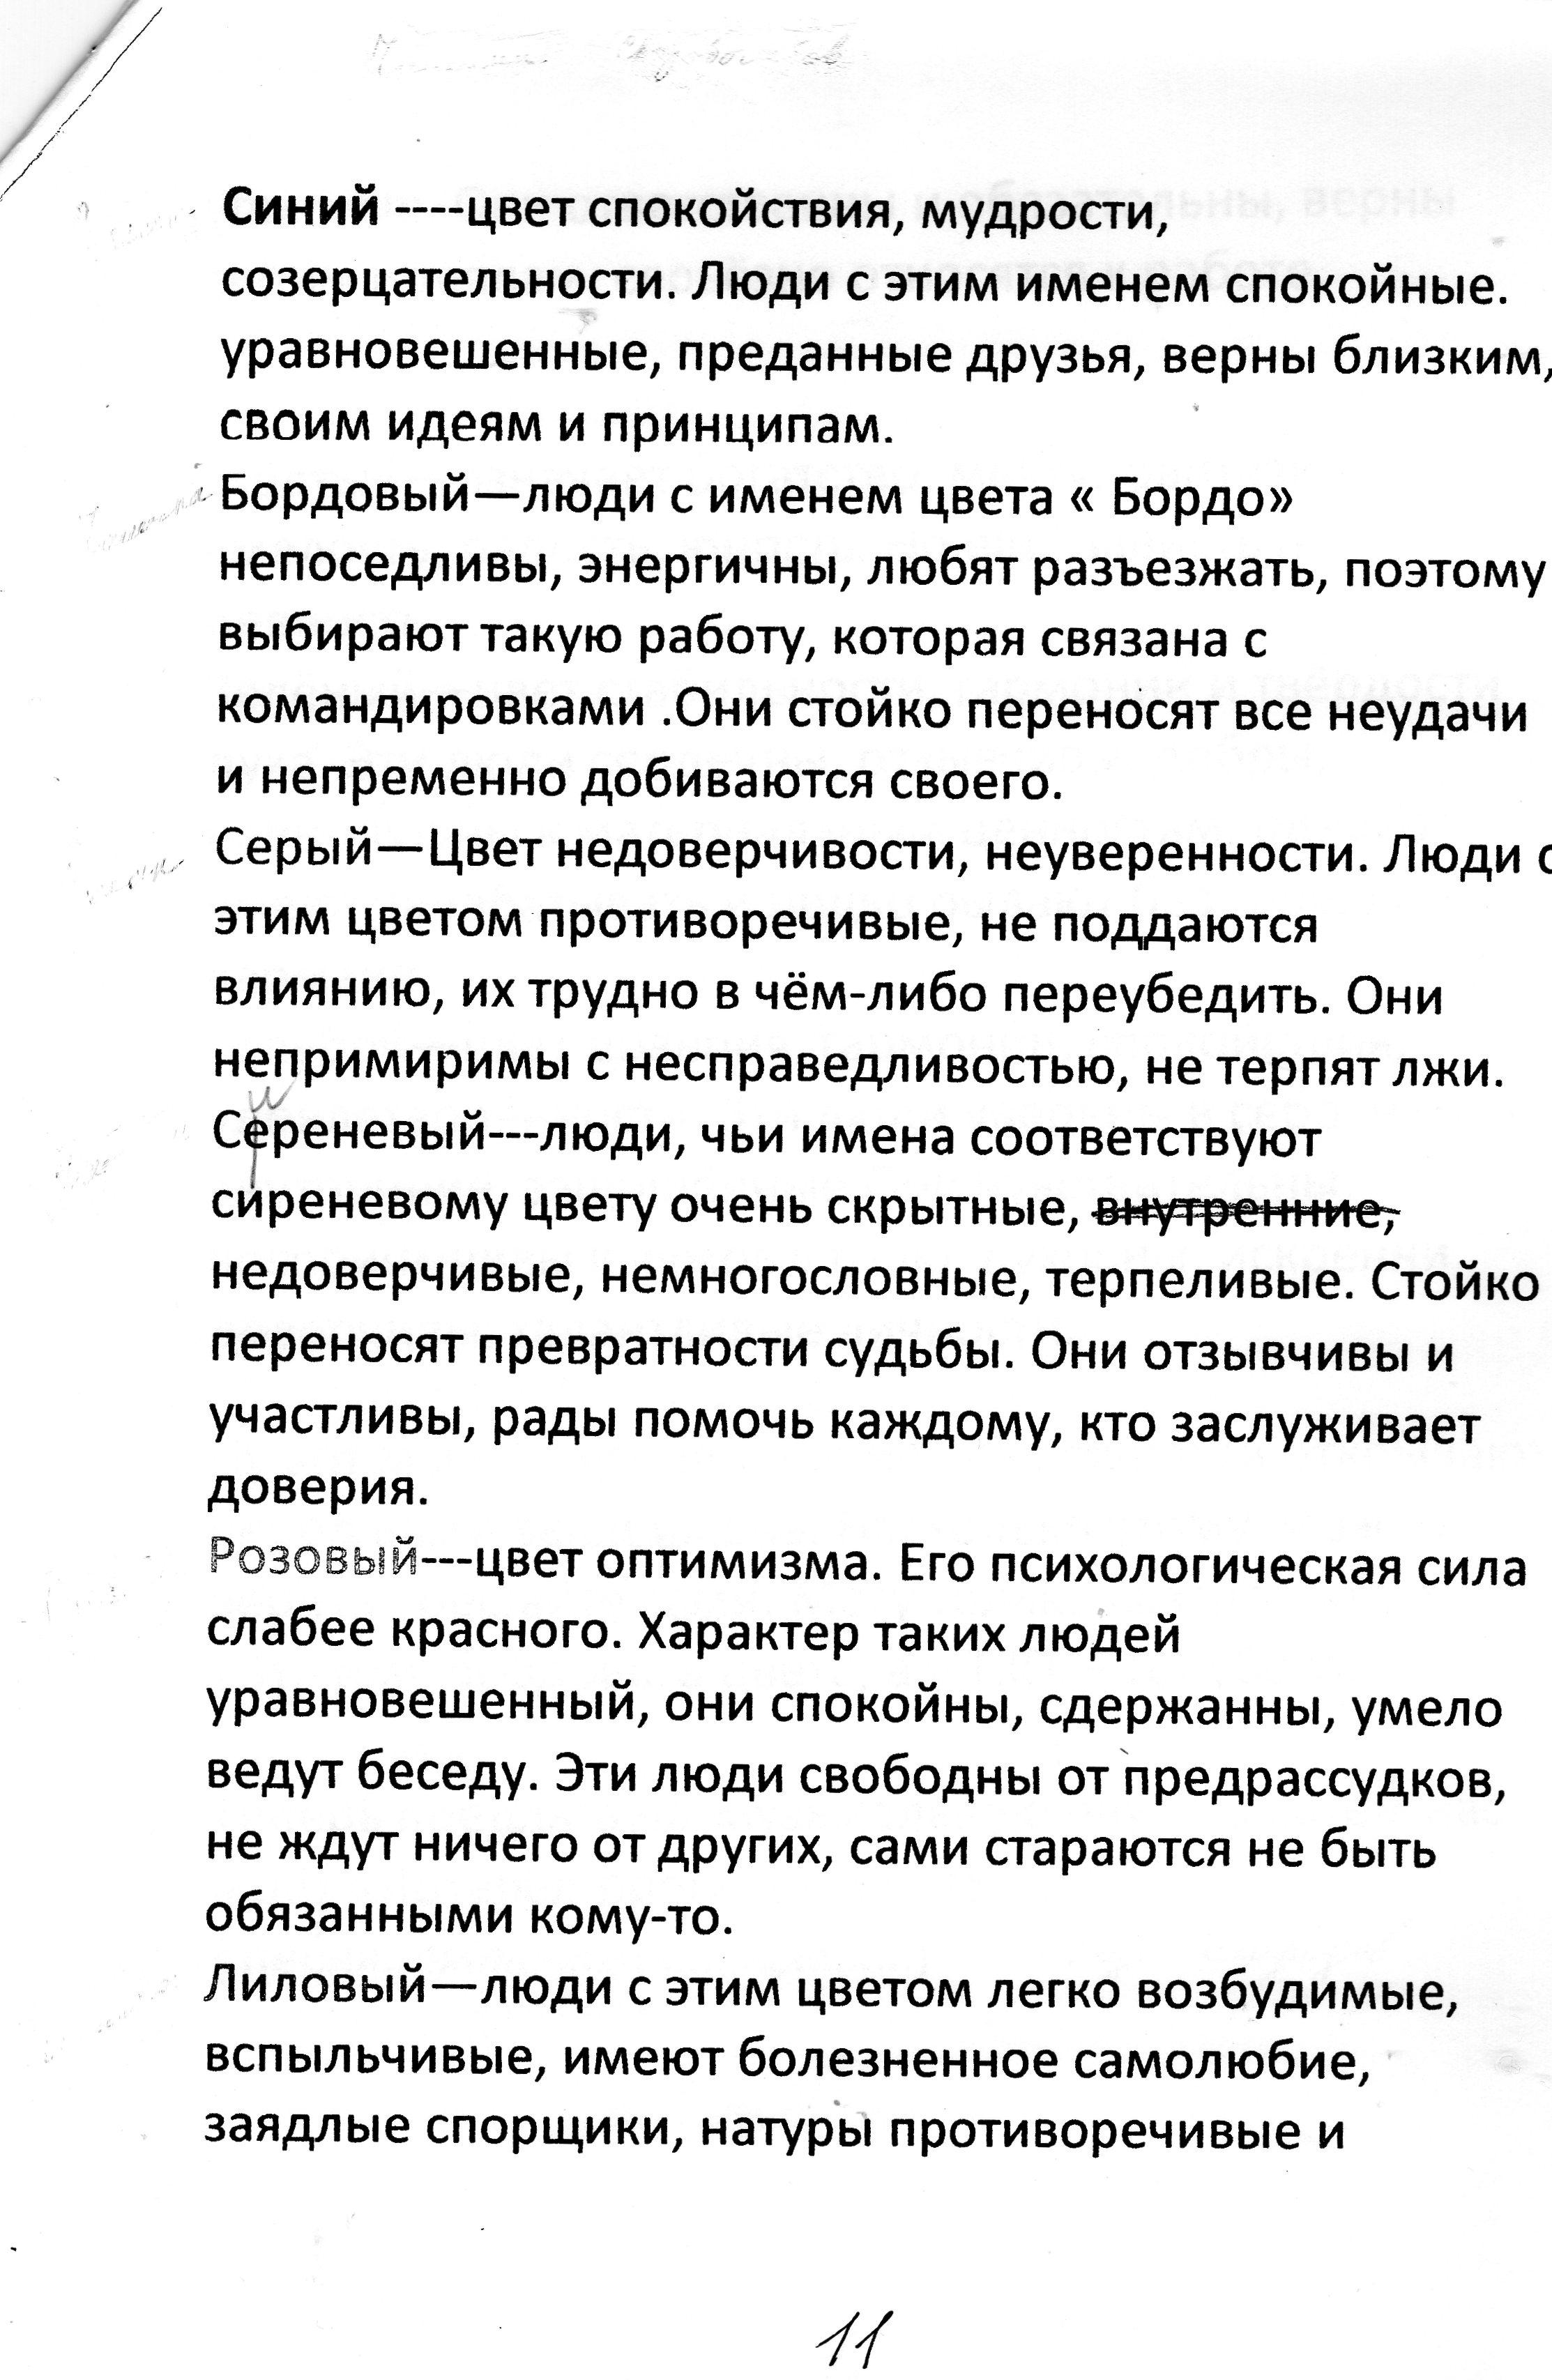 C:\Documents and Settings\ADMIN\Мои документы\9 кл выпускной\img017.jpg